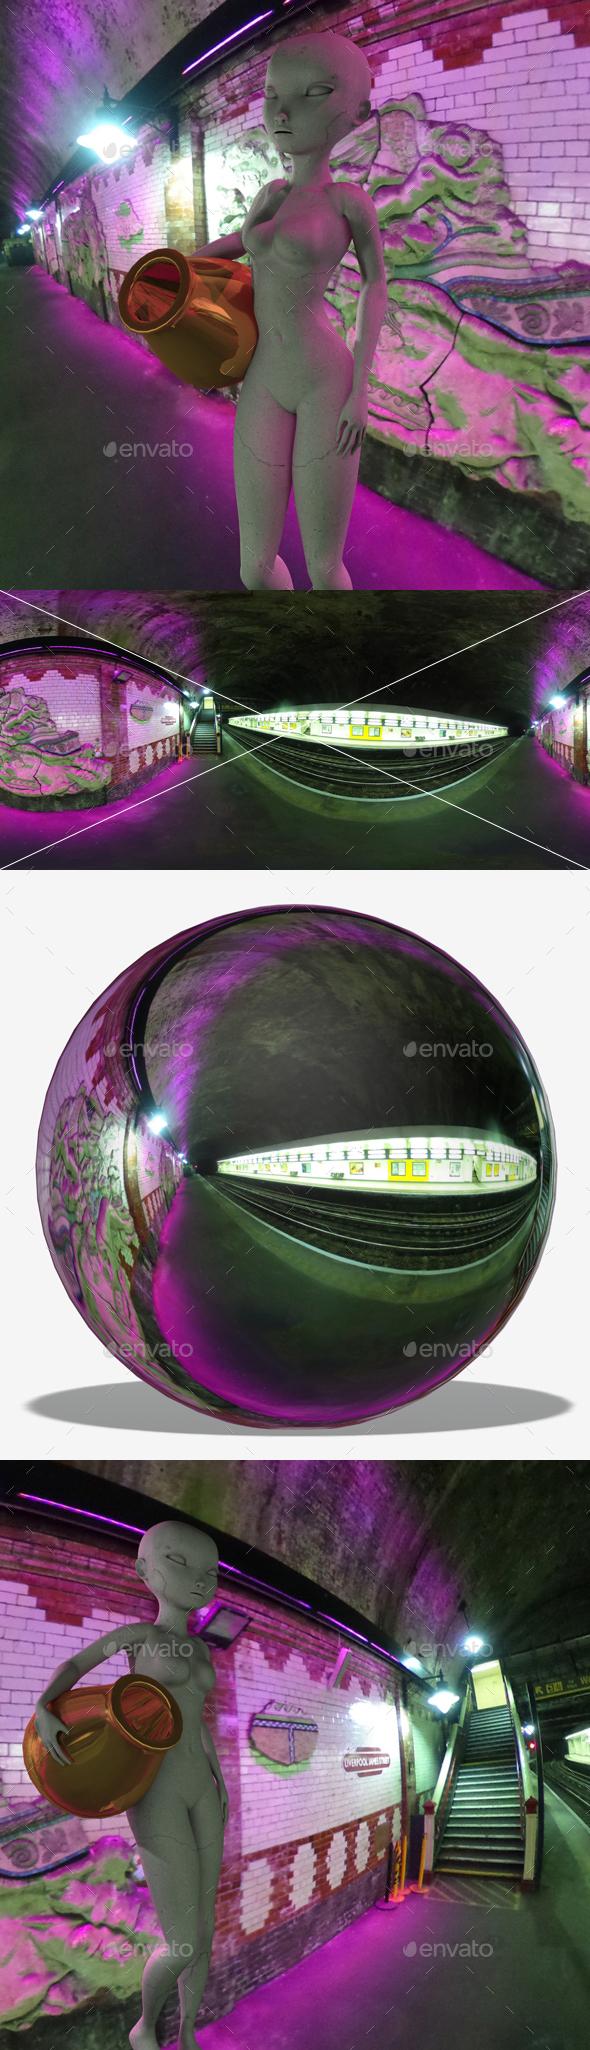 Neon Underground Station HDRI